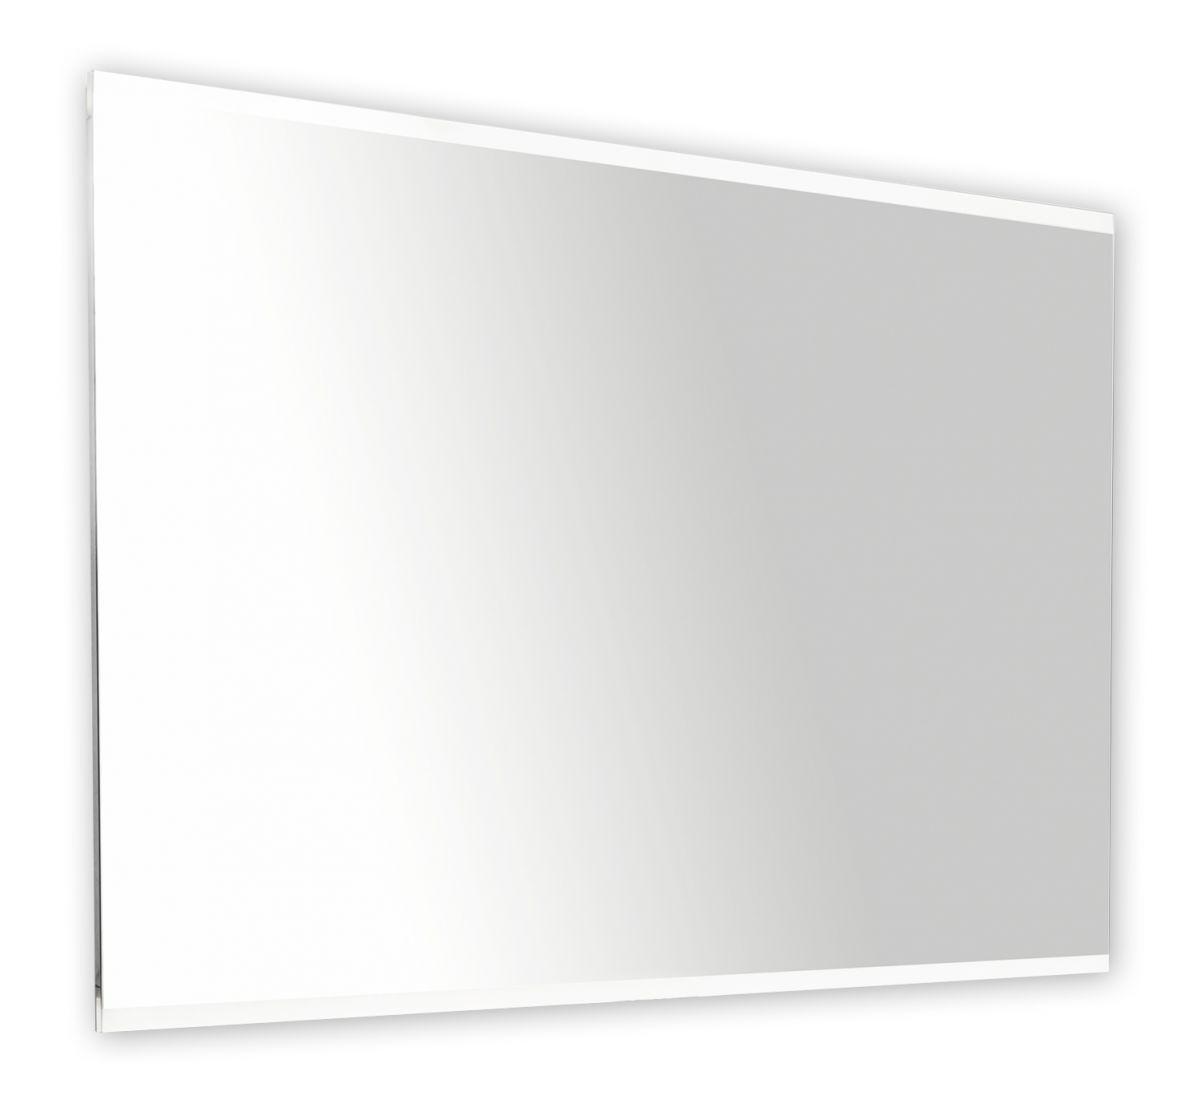 LED Light Mirror Rectangle 1200 x 800